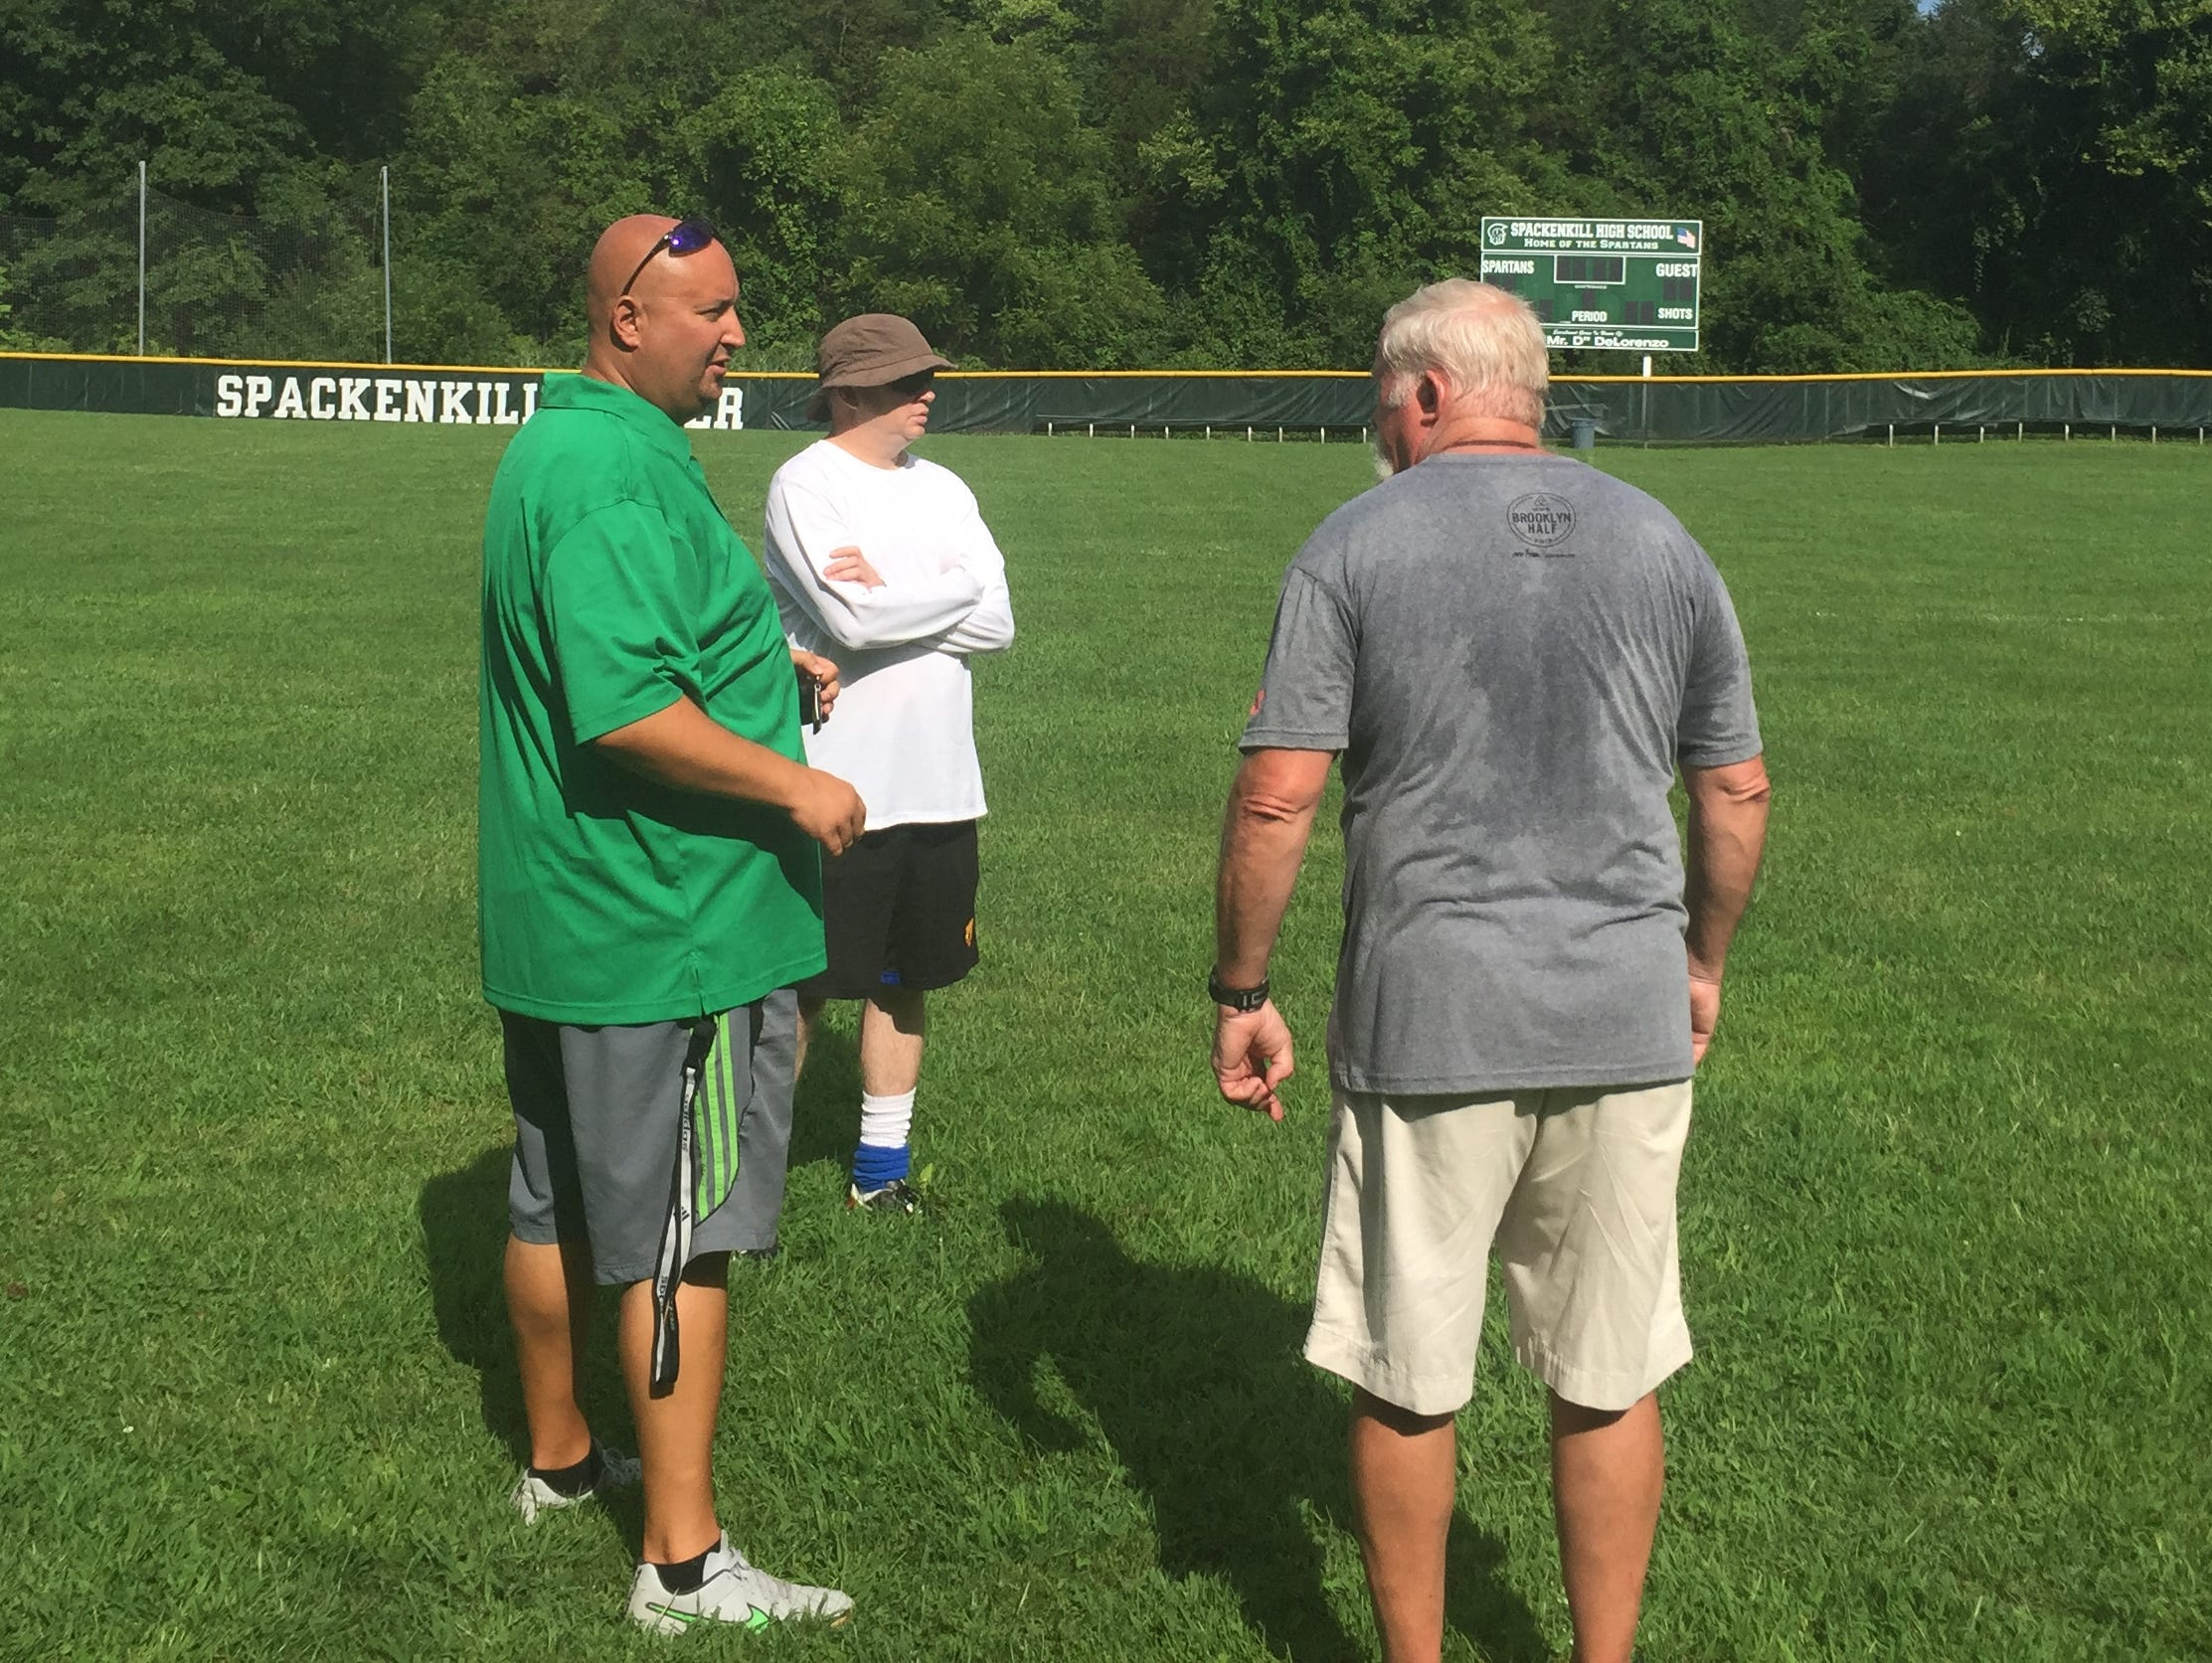 Spackenkill High School boys soccer coach Manny Blanco, left, talks with girls soccer coach Mike Corbett, right, at preseason practice on Monday.